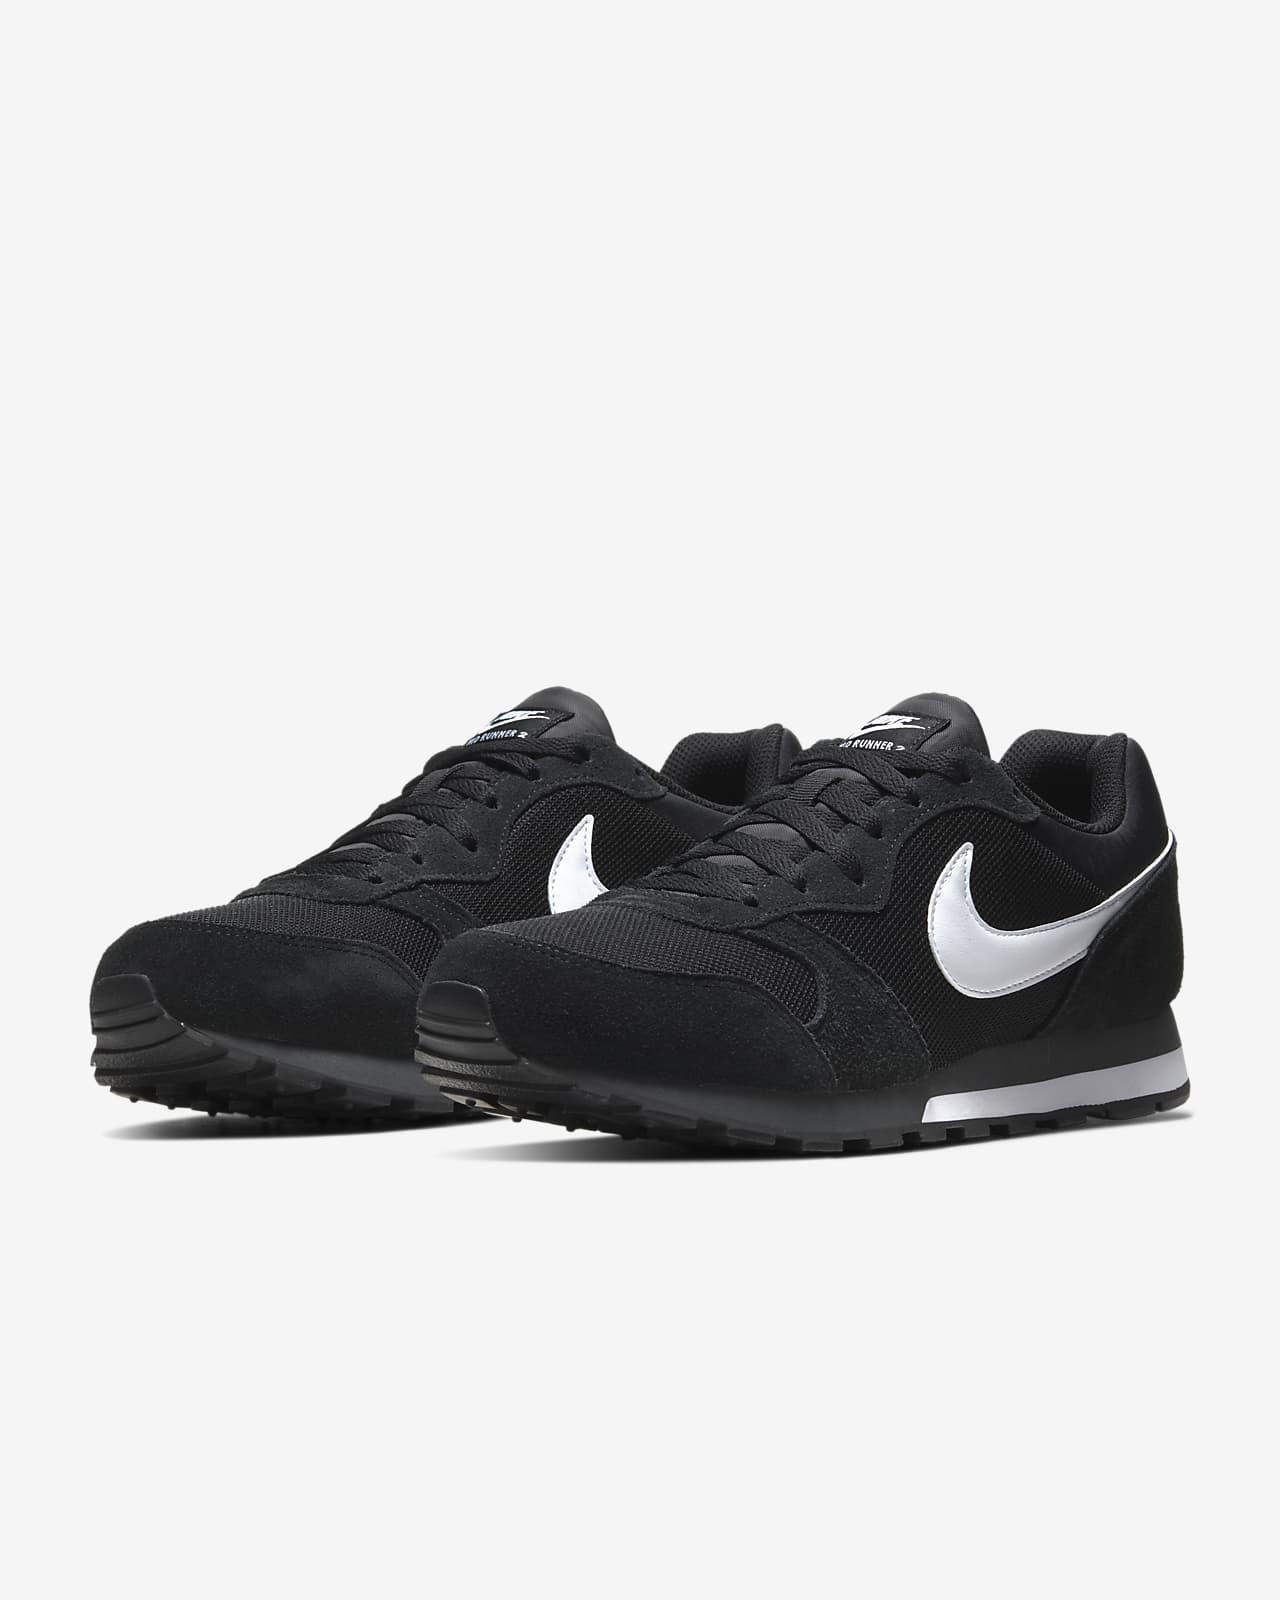 nike zapatillas hombre runner 2